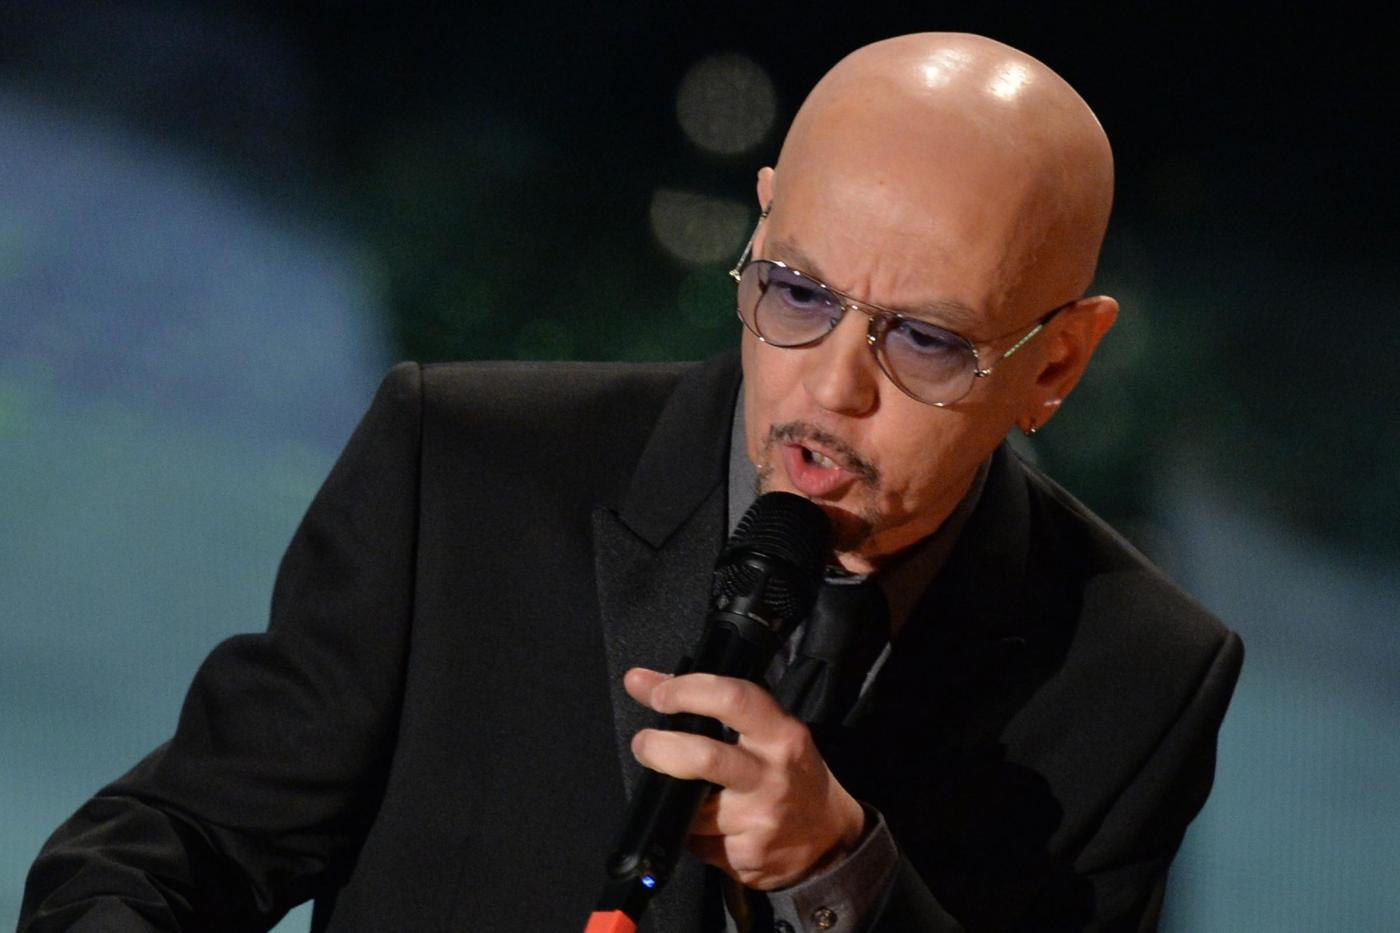 Enrico Ruggeri Sanremo 2015 Tre Signori